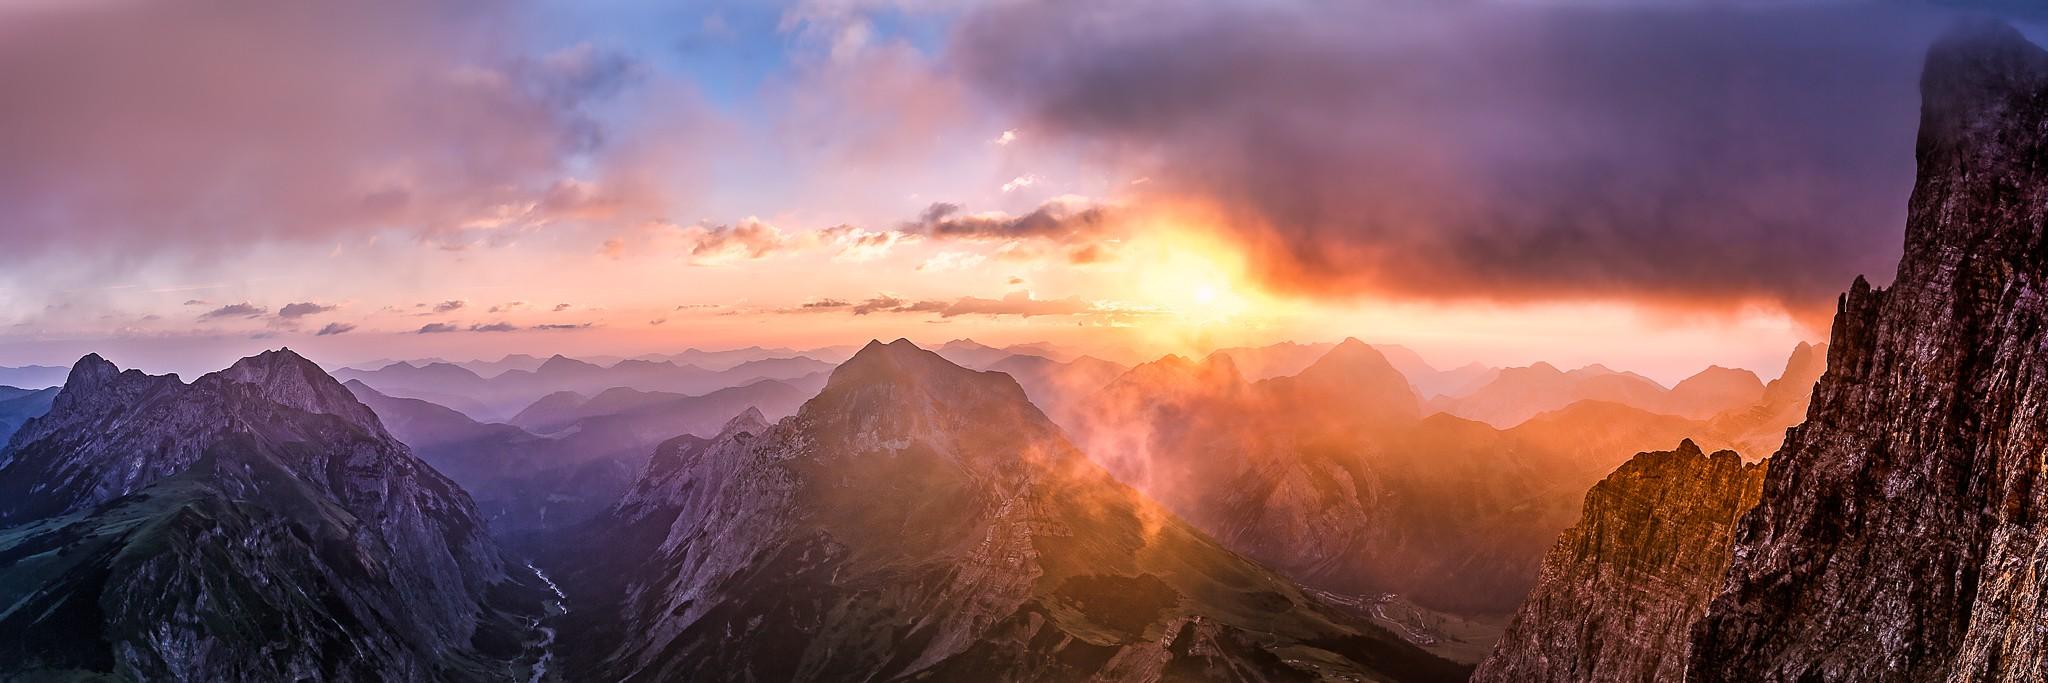 Laliderer Wand - Tief- und Weitblick - Bergpanorama Sonnenaufgang